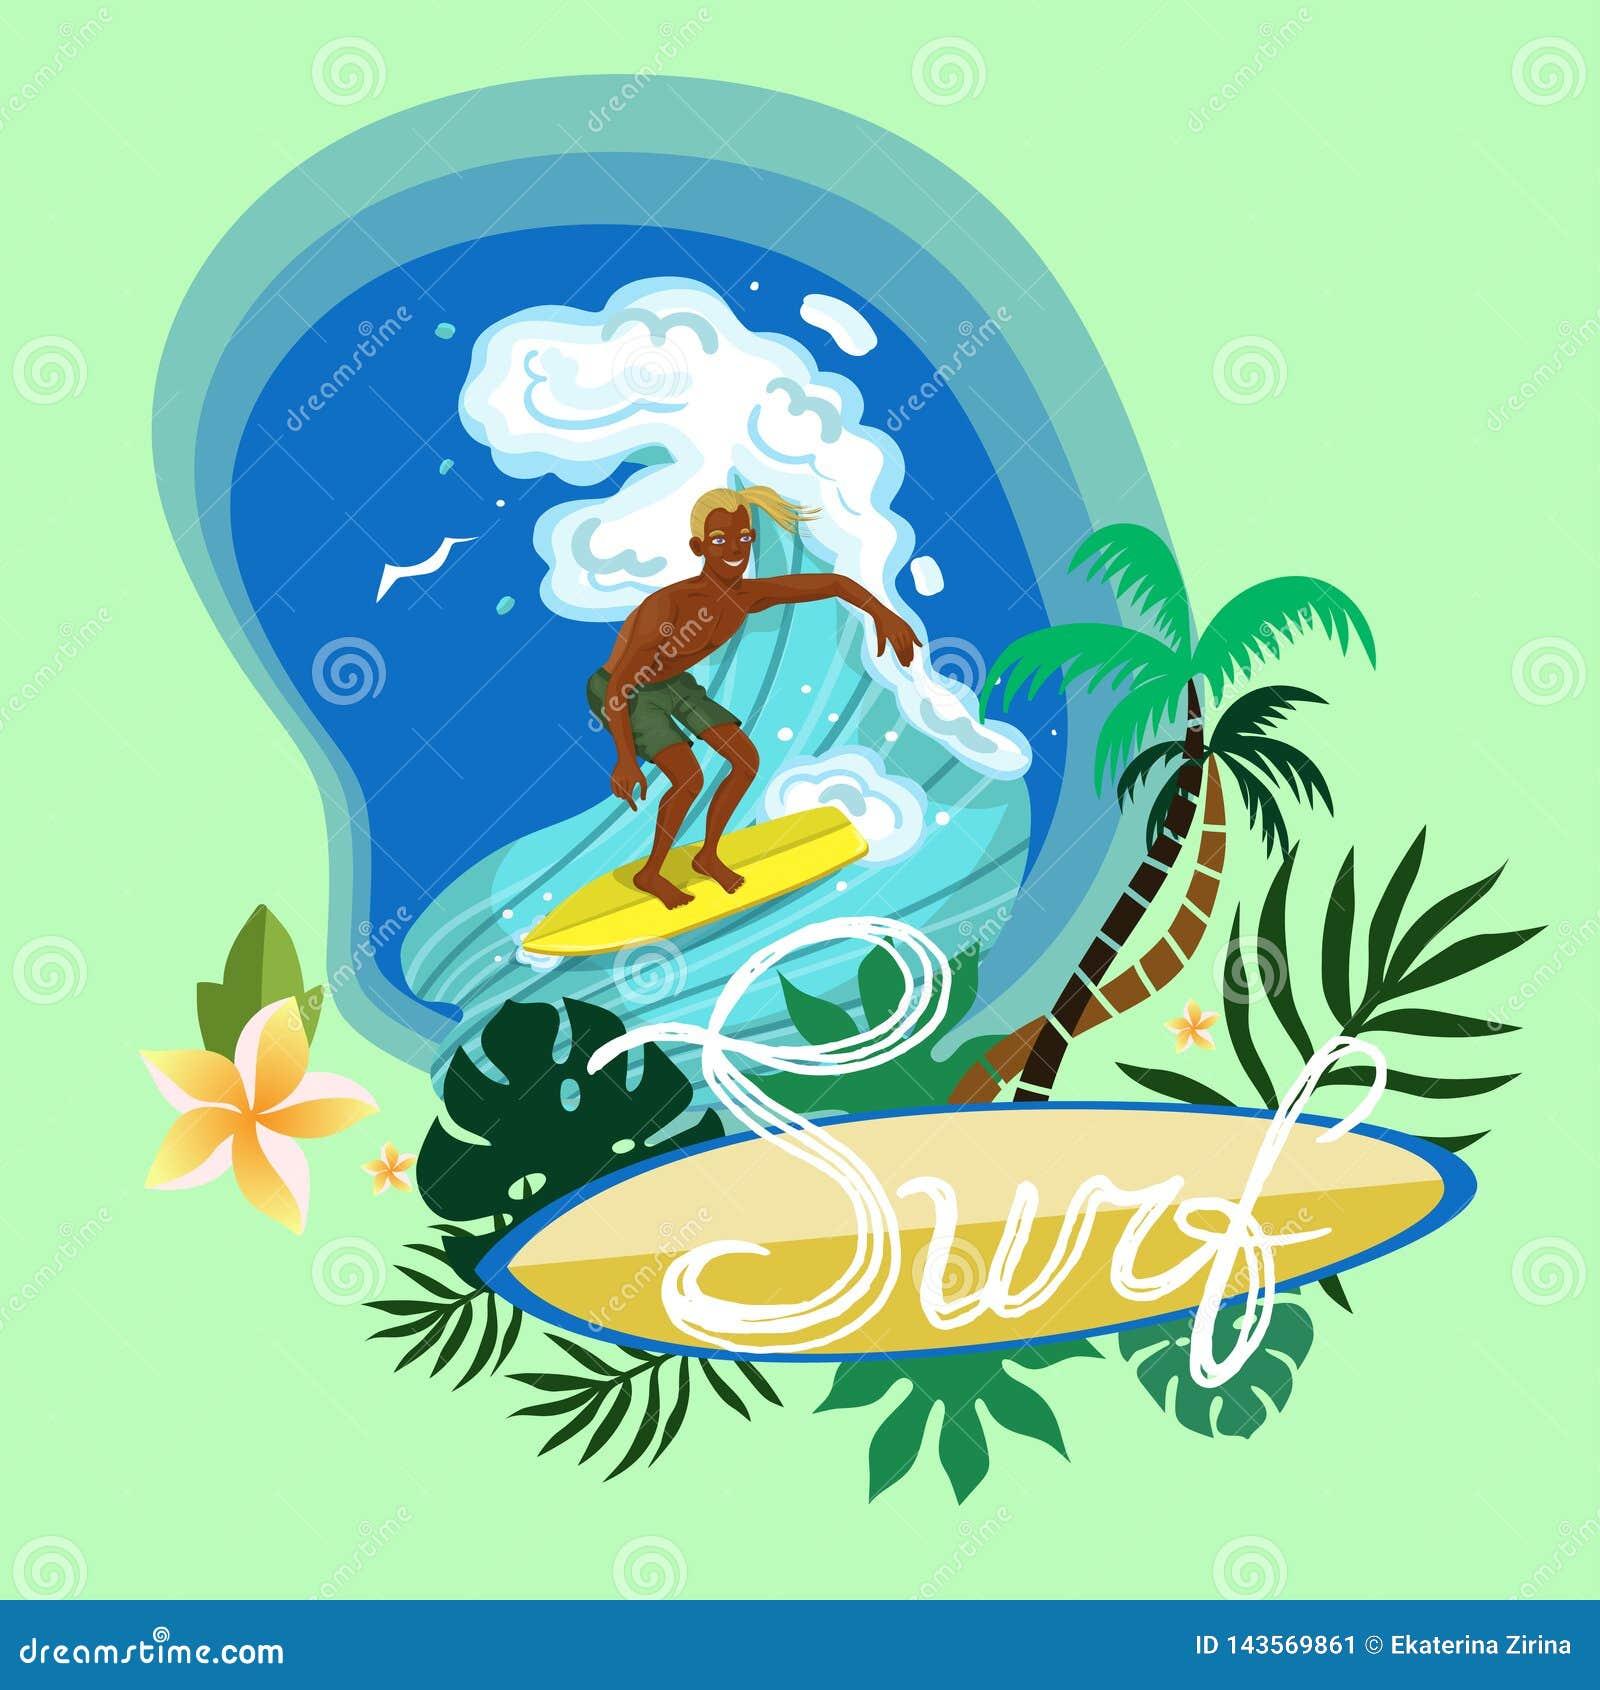 Surfing man conquering a wave logo vector image